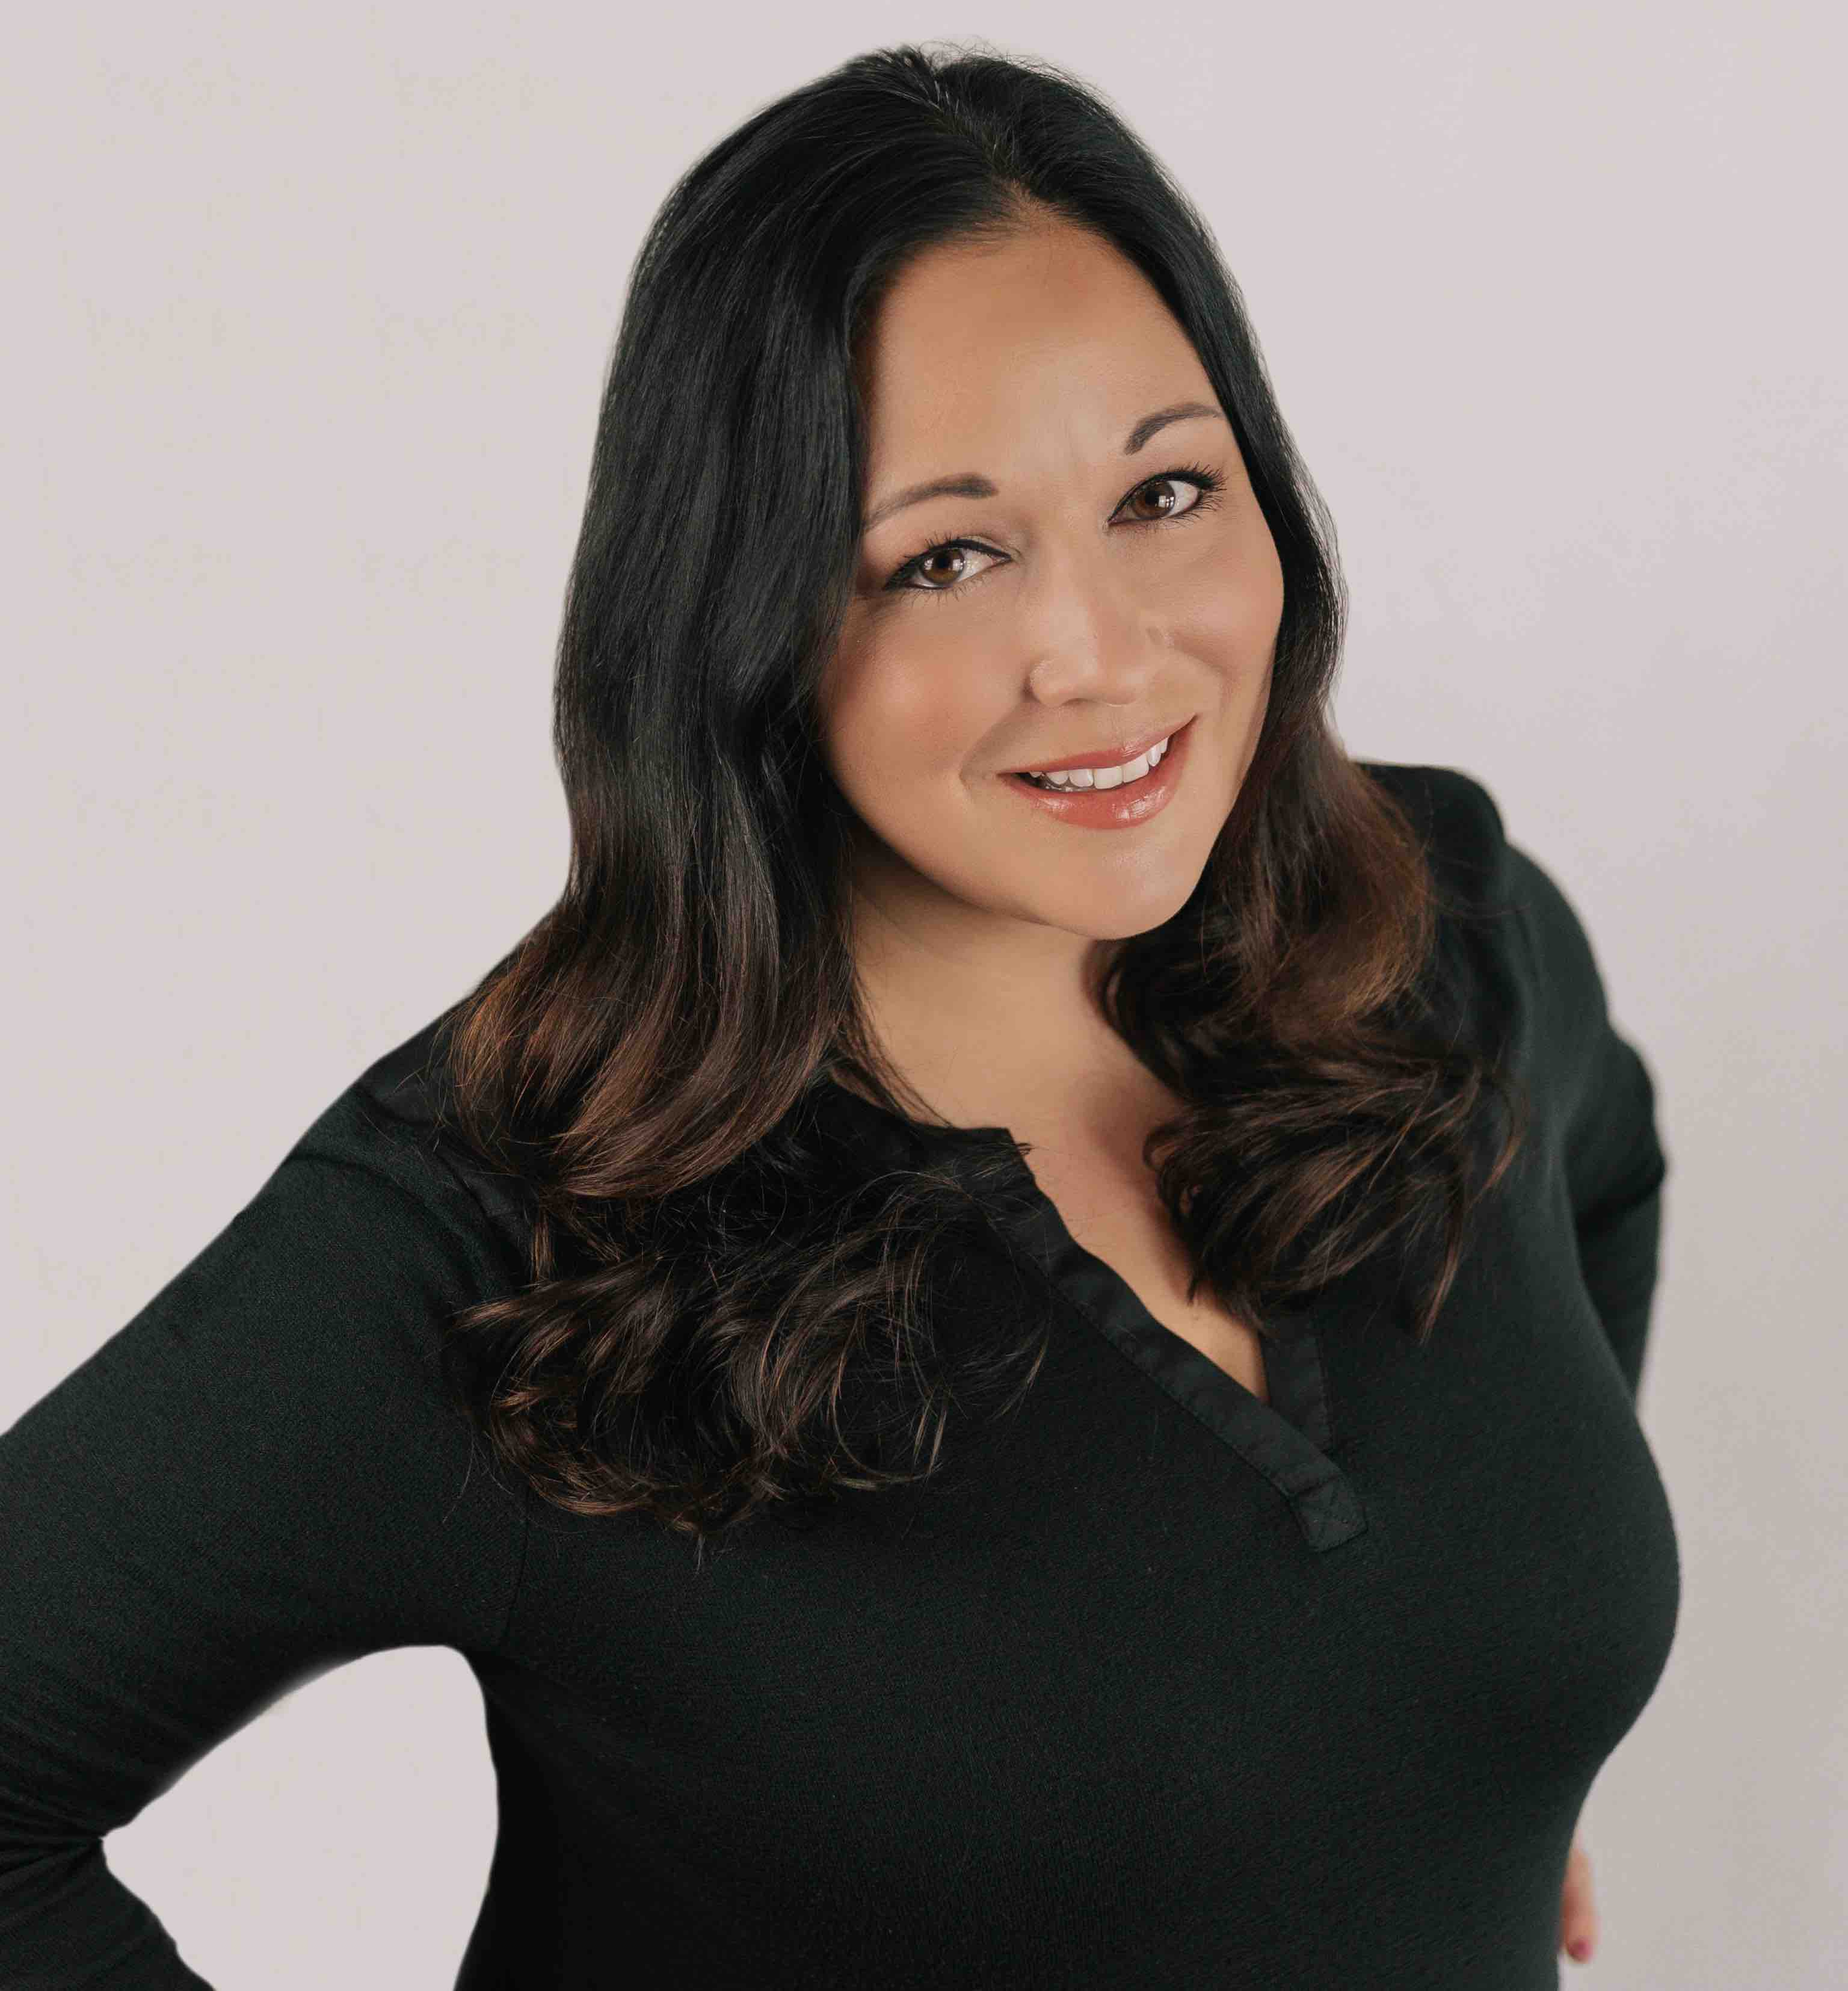 Marisa Bryson